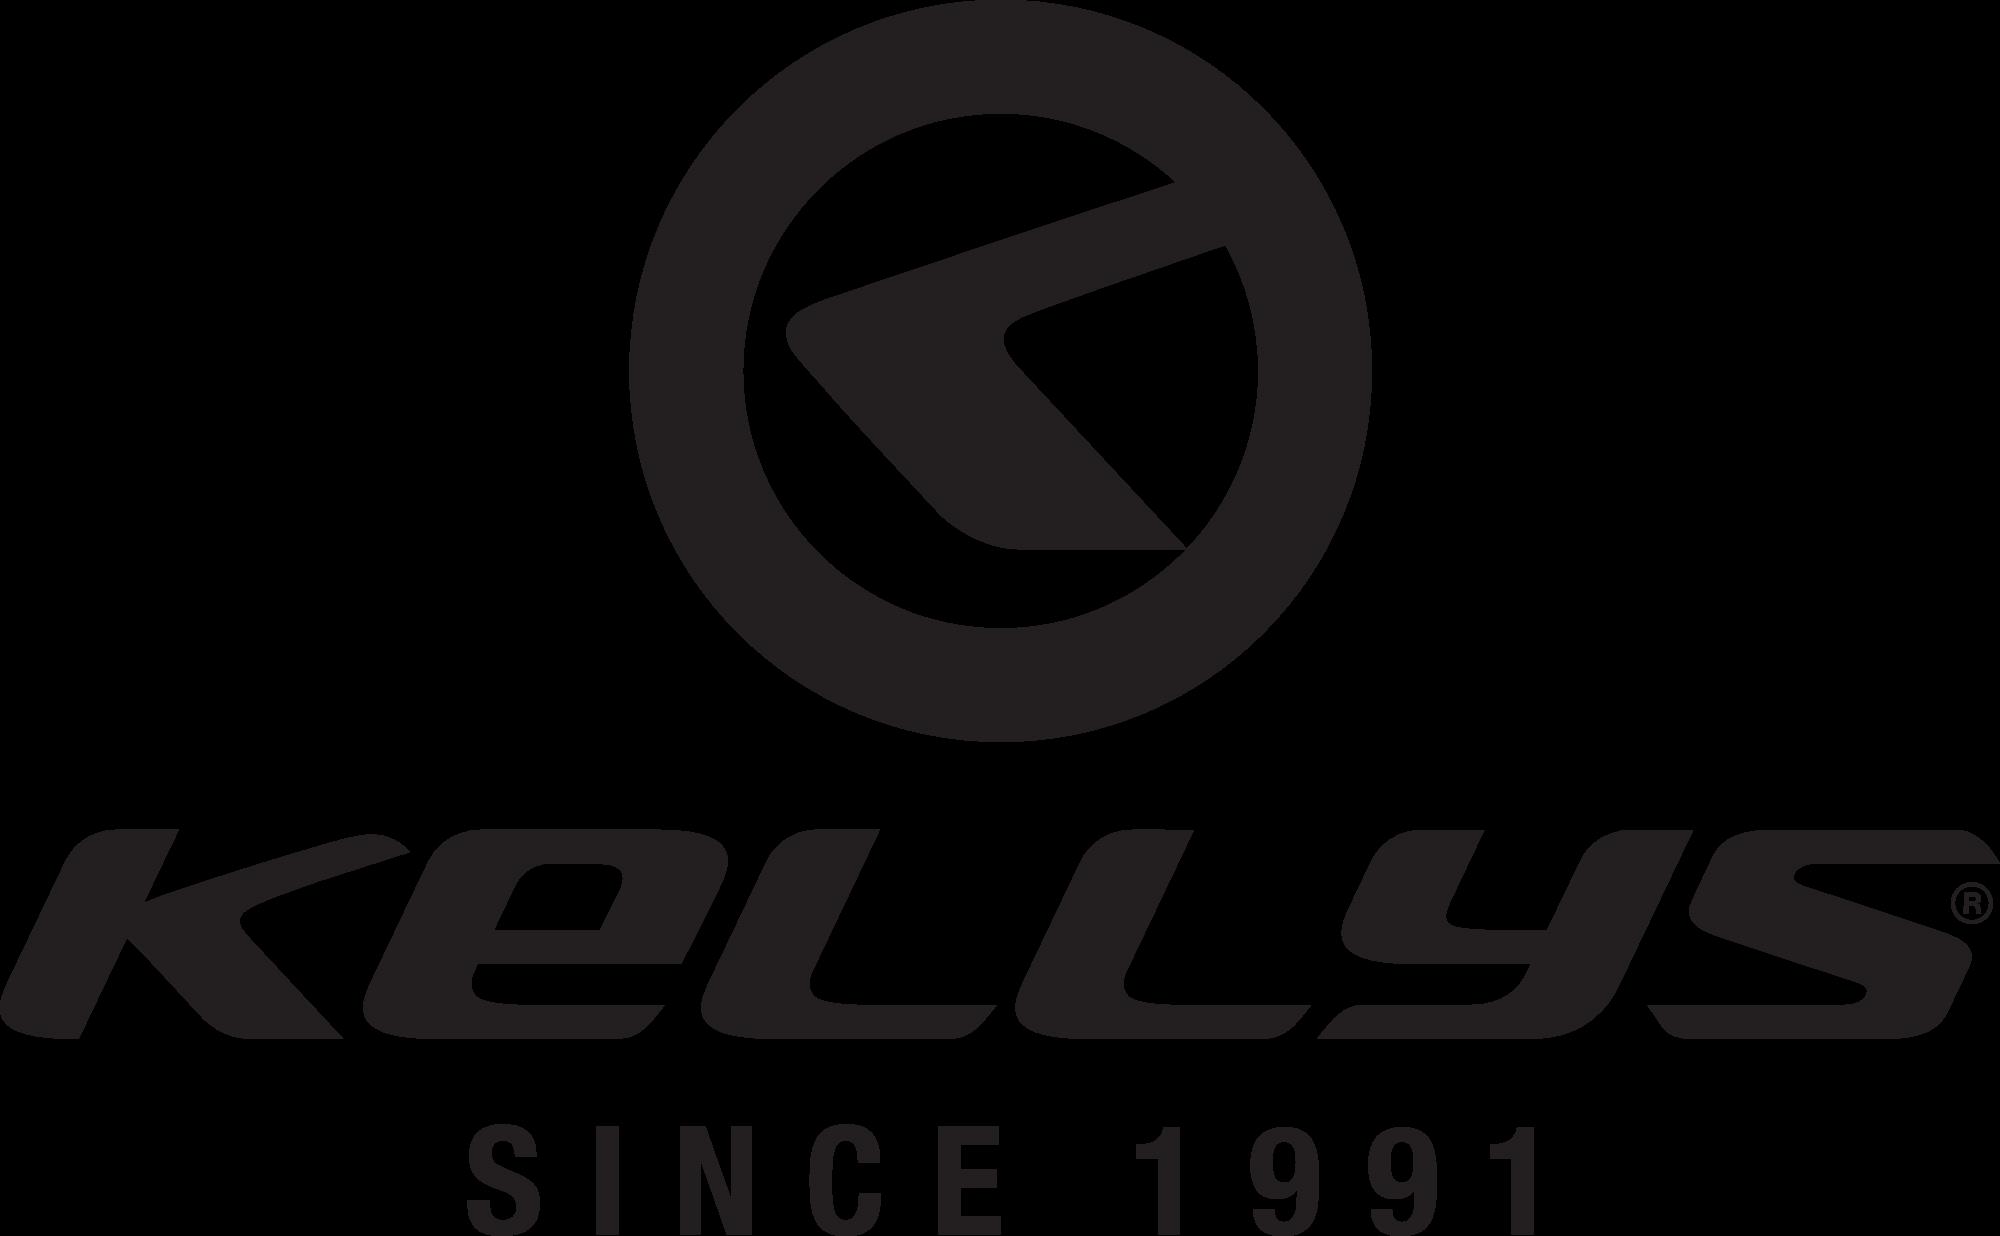 kellys_bicycles_logo